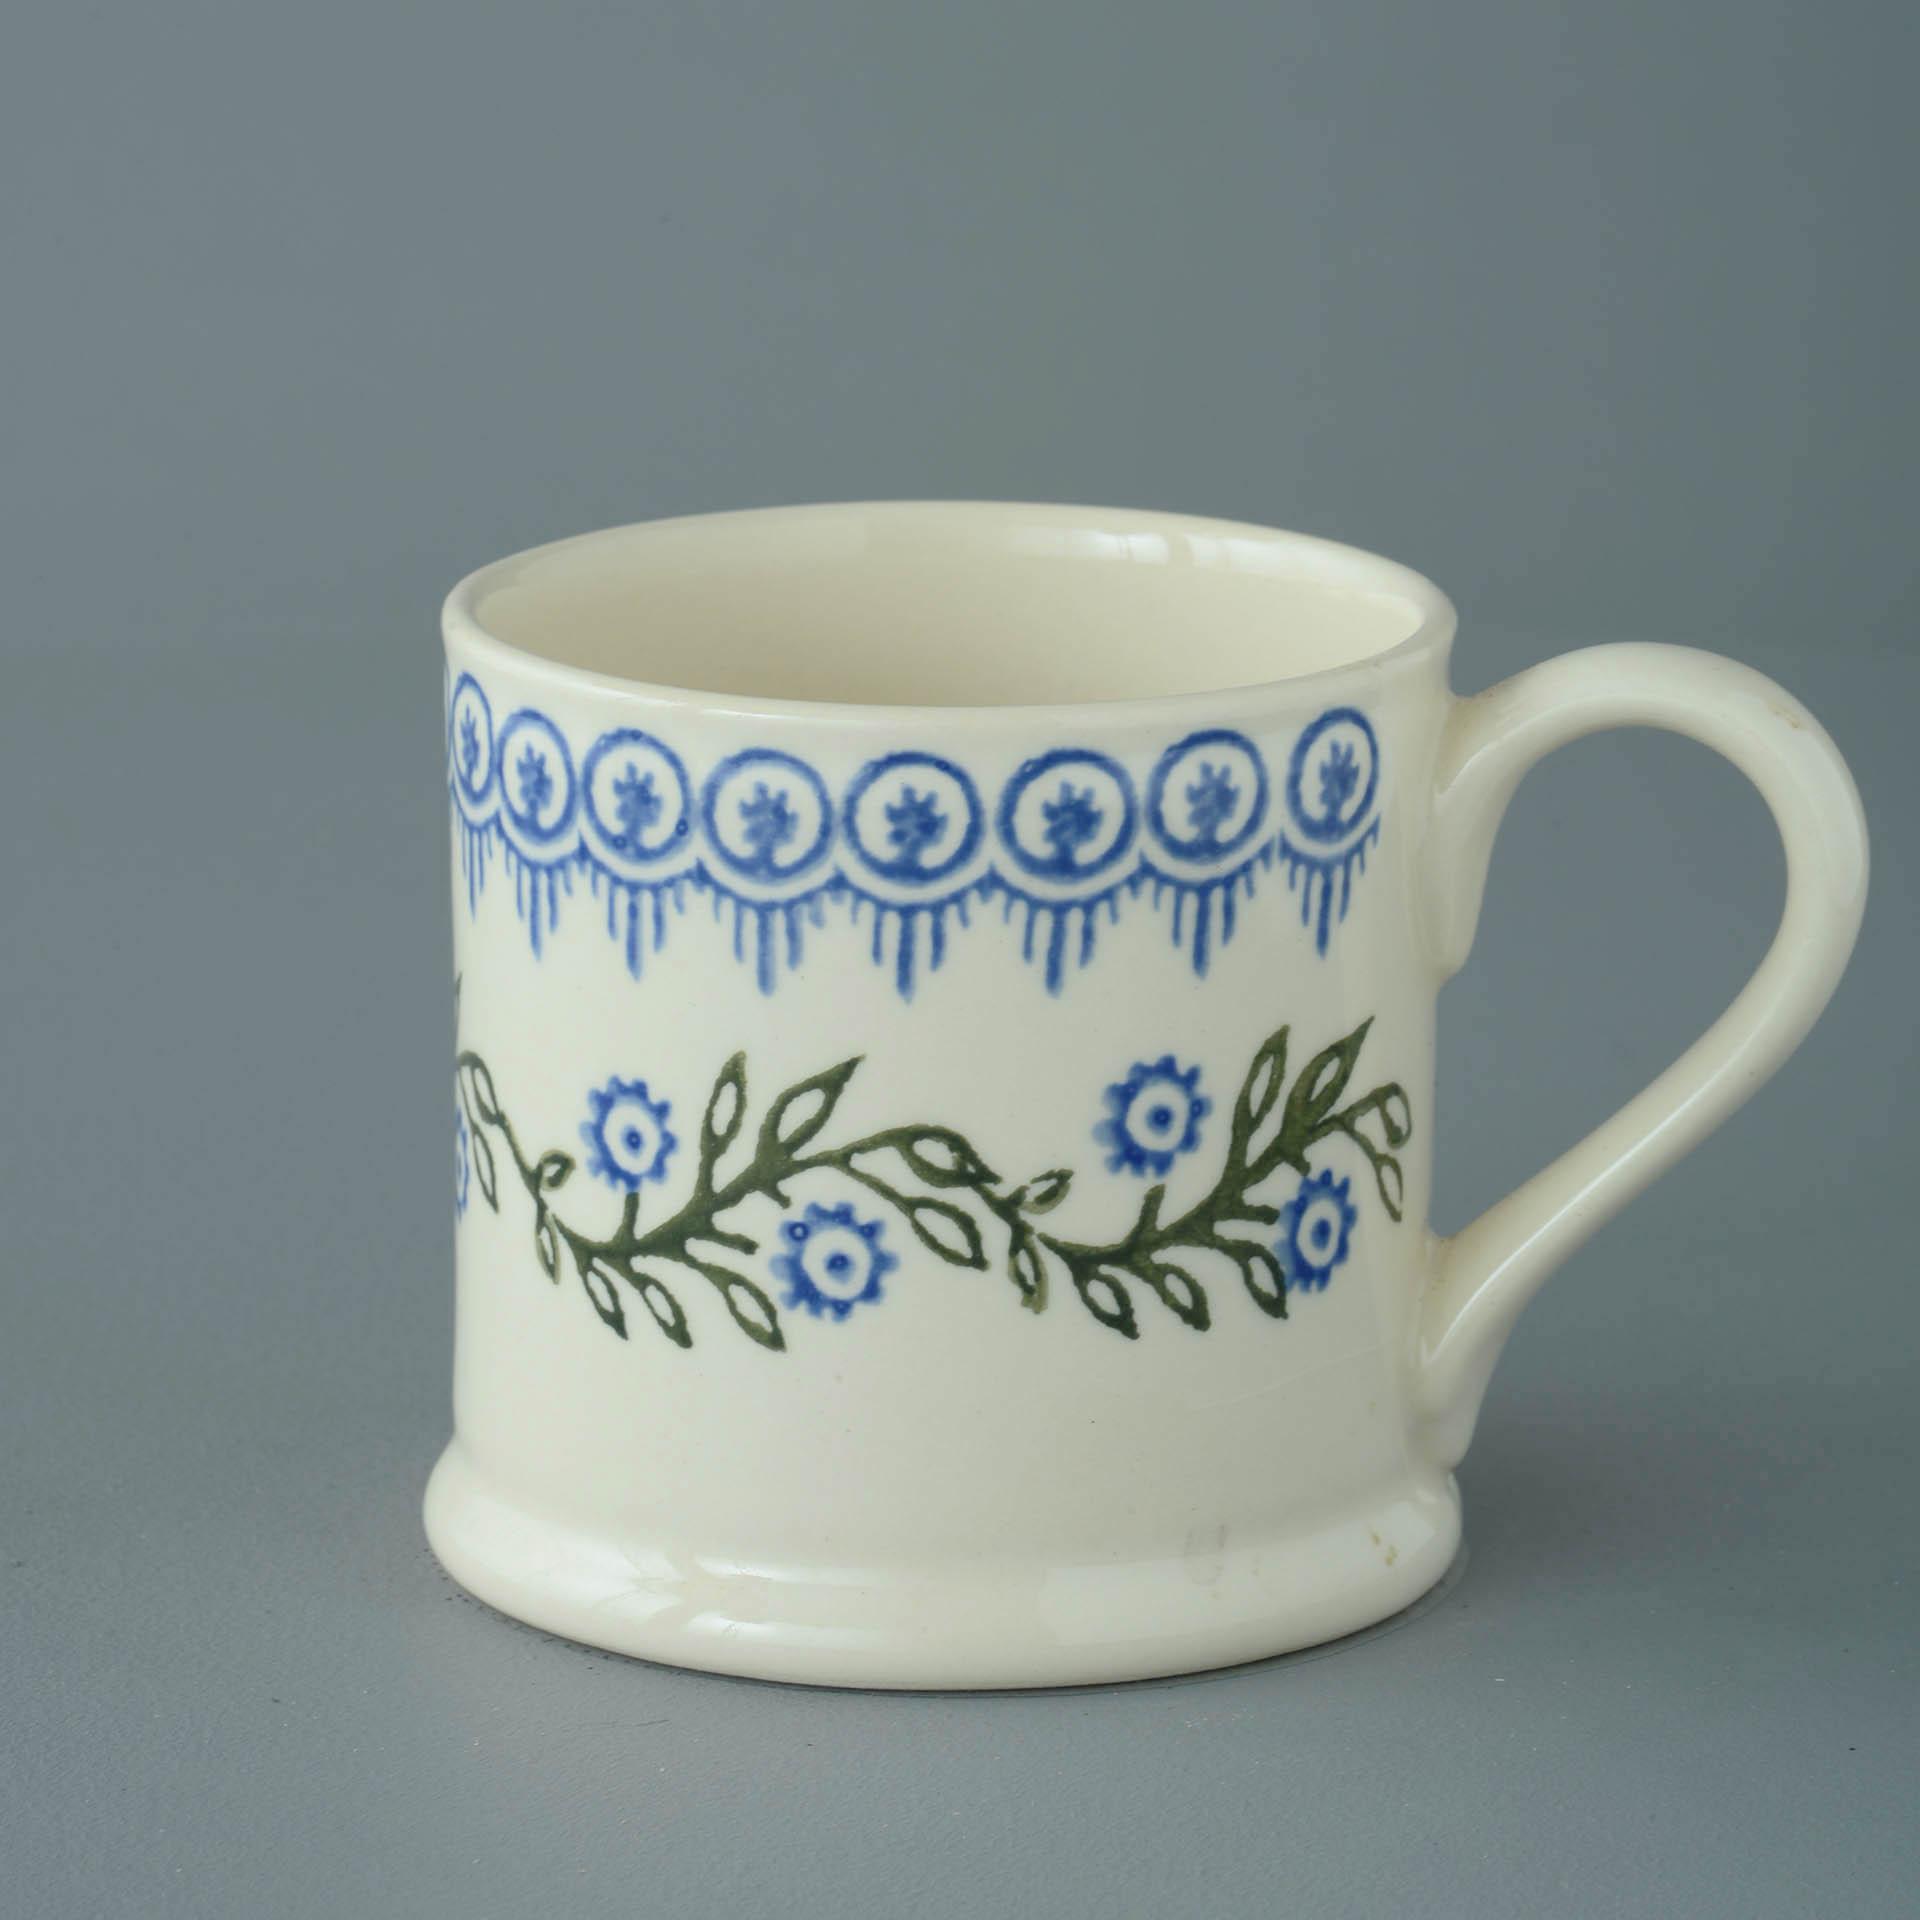 Floral Garland 250ml Large Mug 8 x 8.4cm